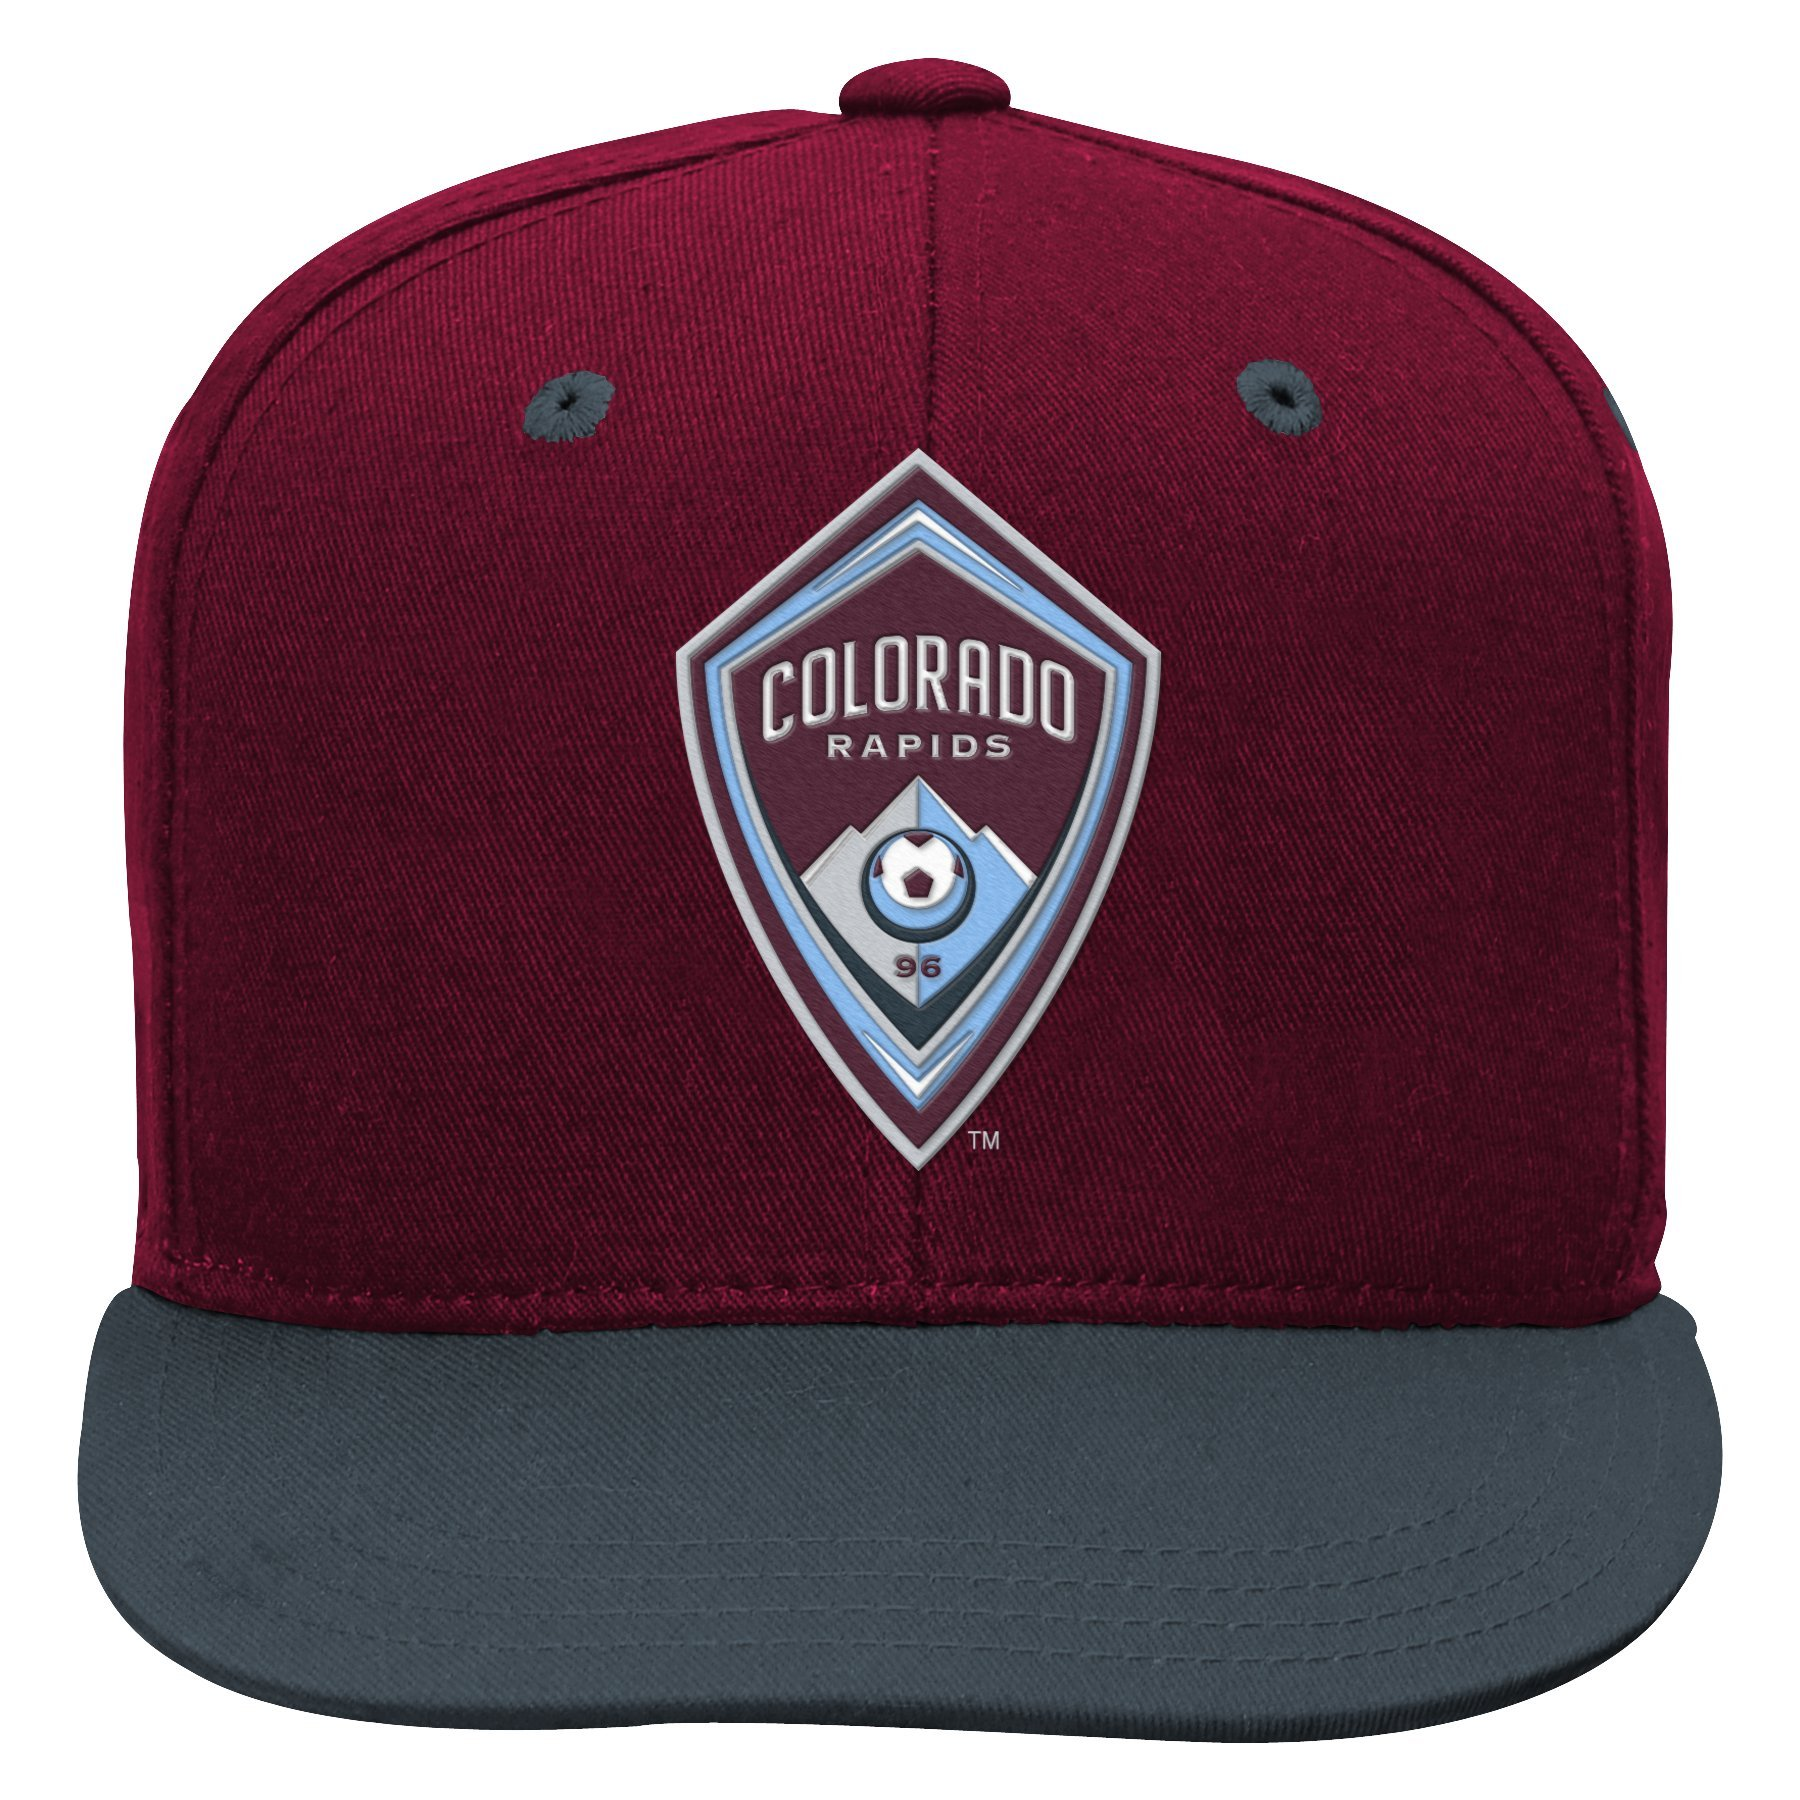 Outerstuff MLS Colorado Rapids Boys Flat Visor Snapback, Burgundy, One Size